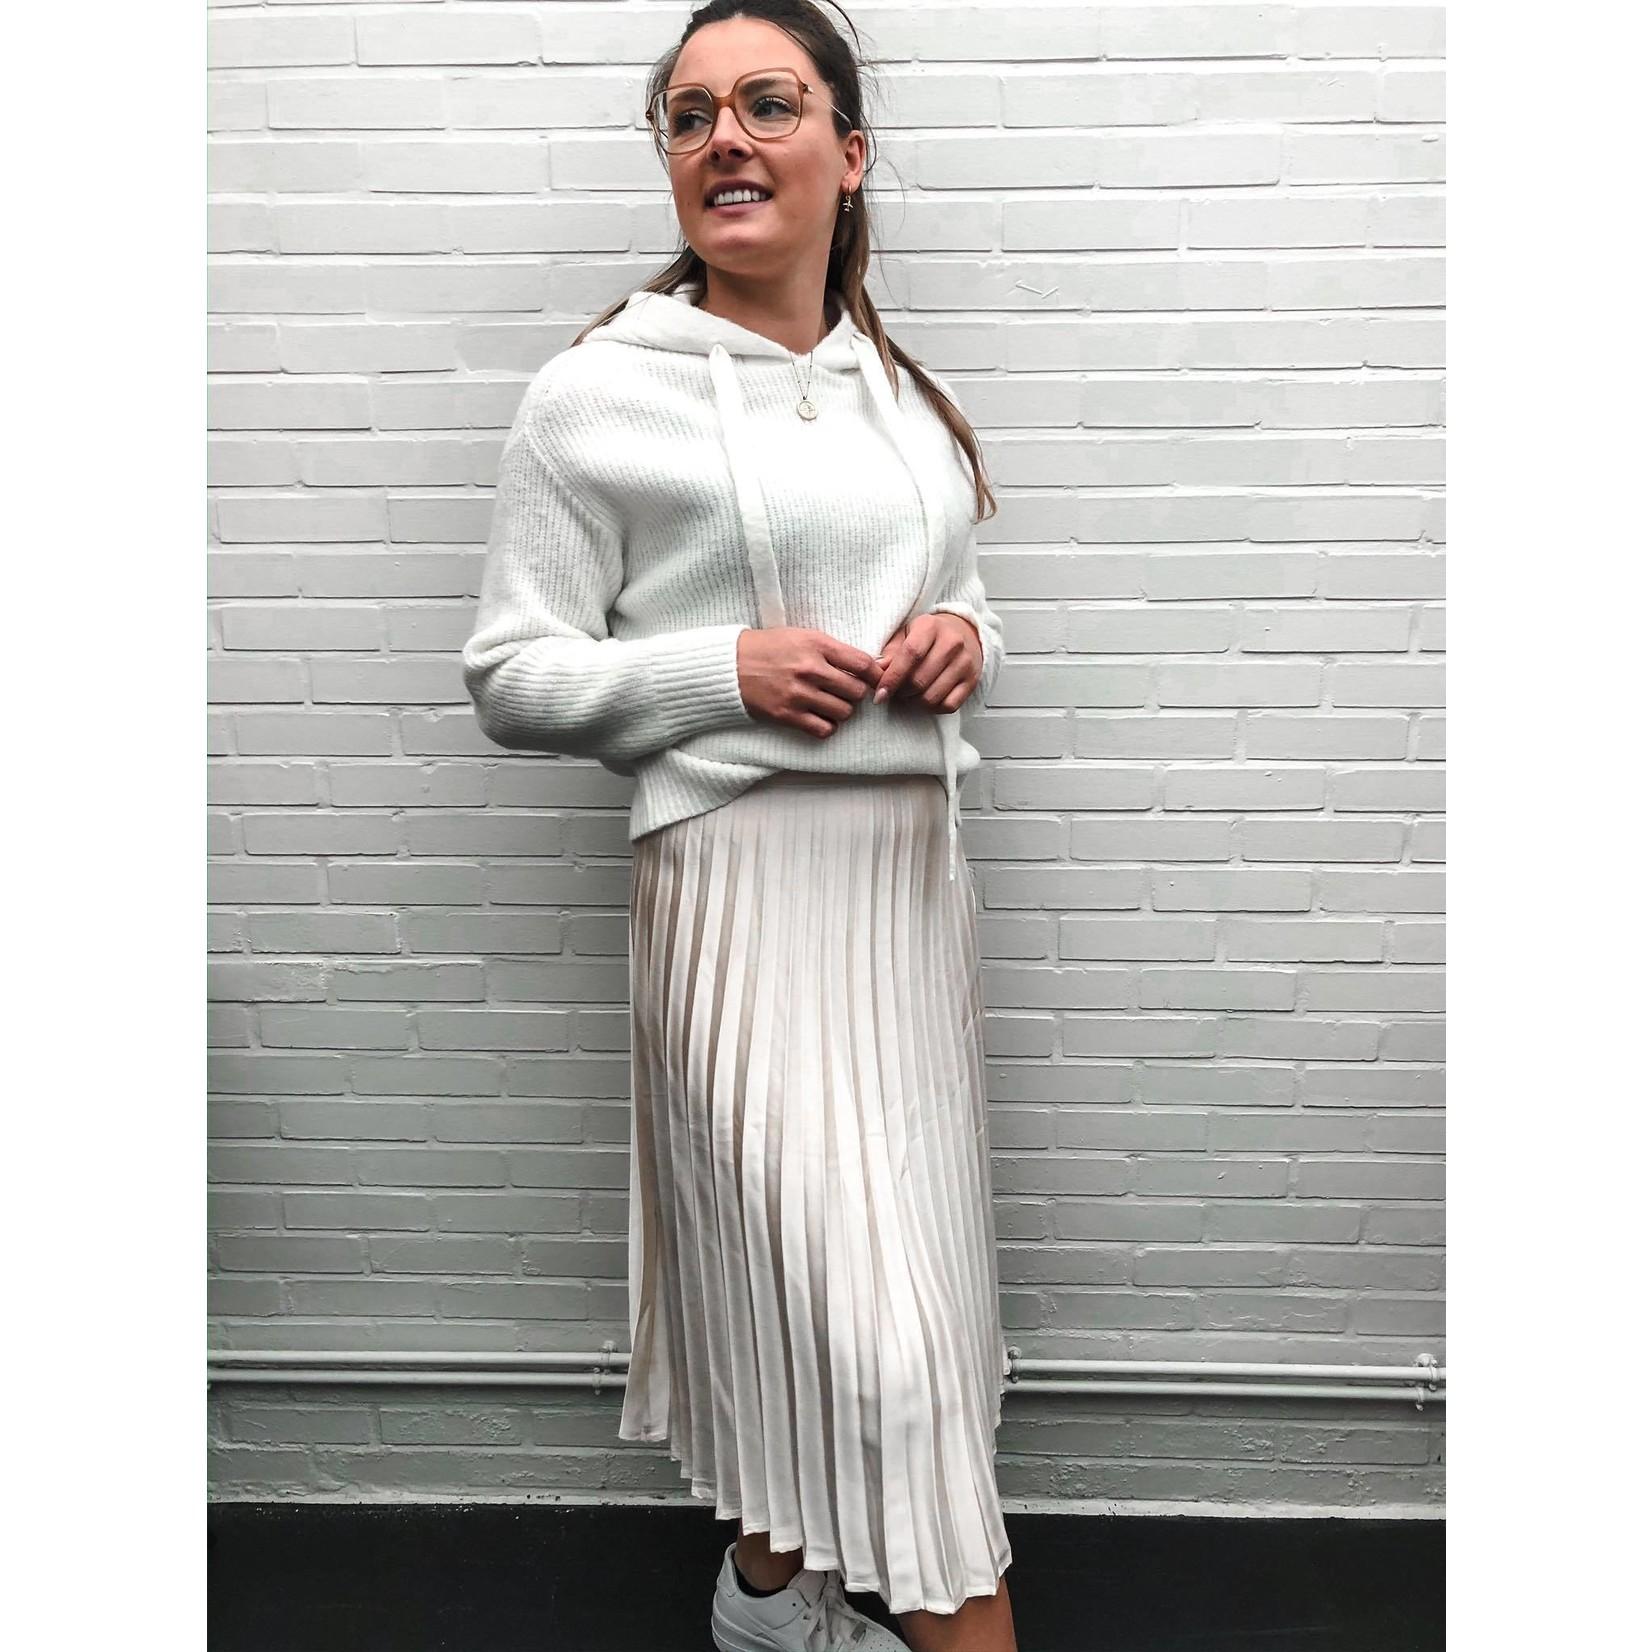 BIANCA PLEATED SKIRT beige